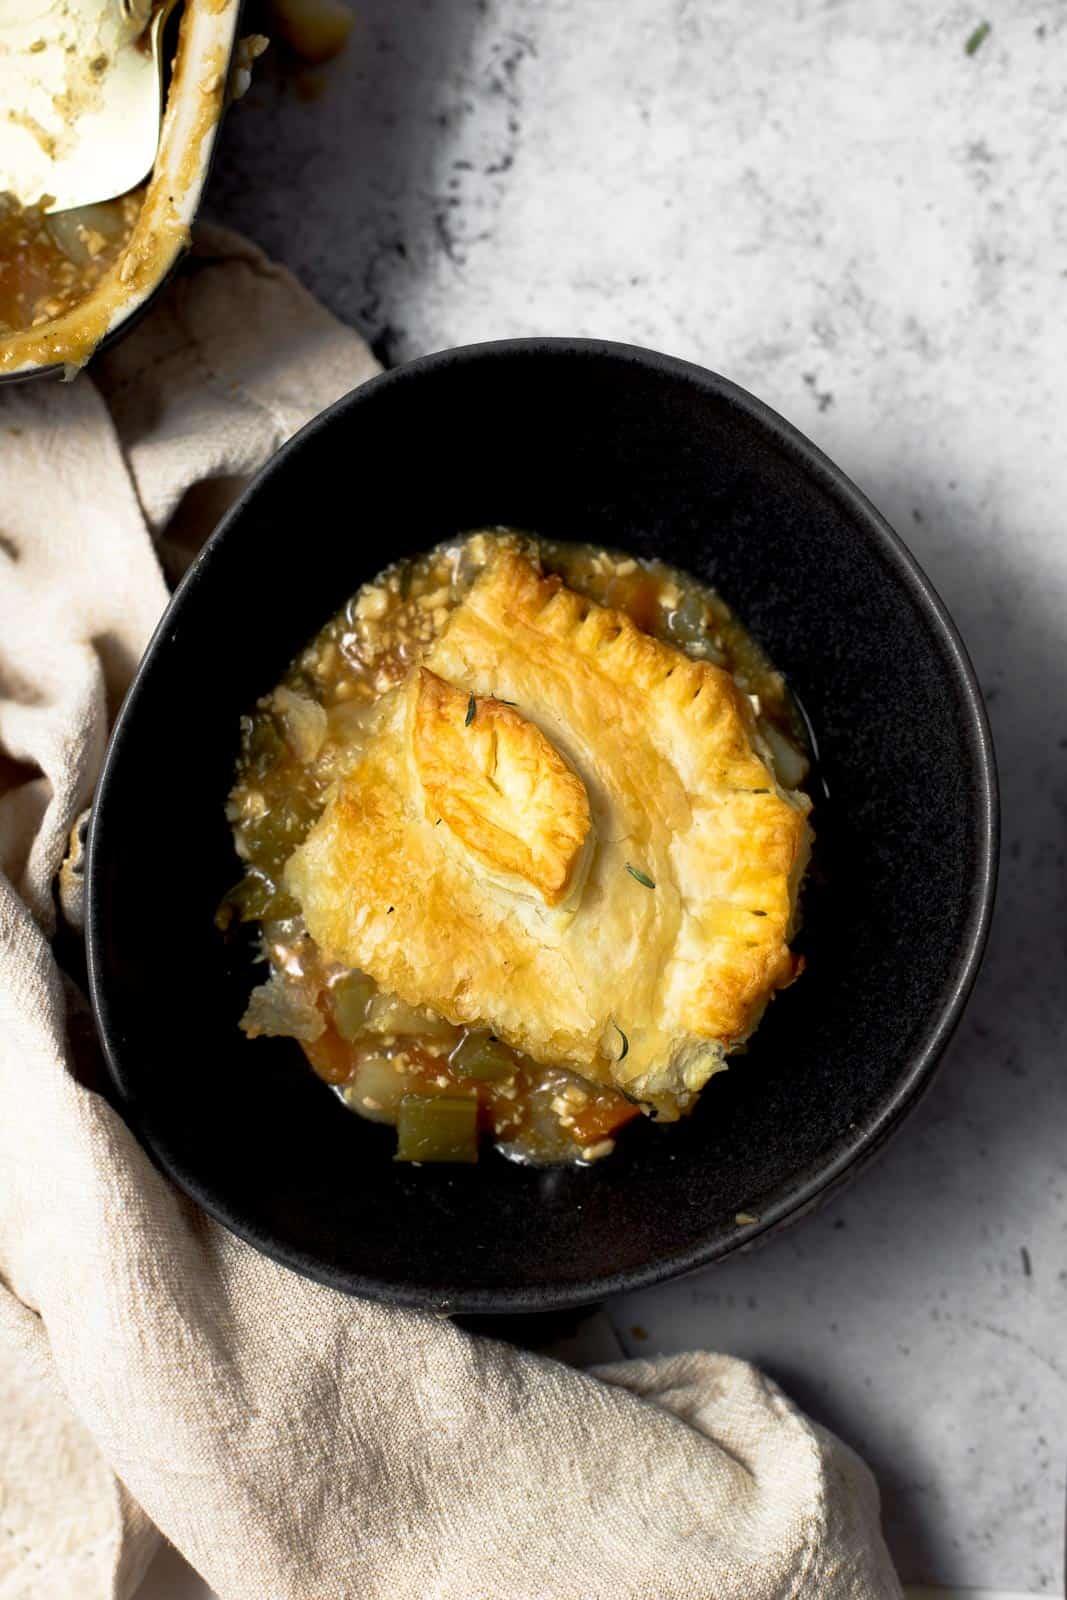 A slice of vegan pie in a large dark bowl.